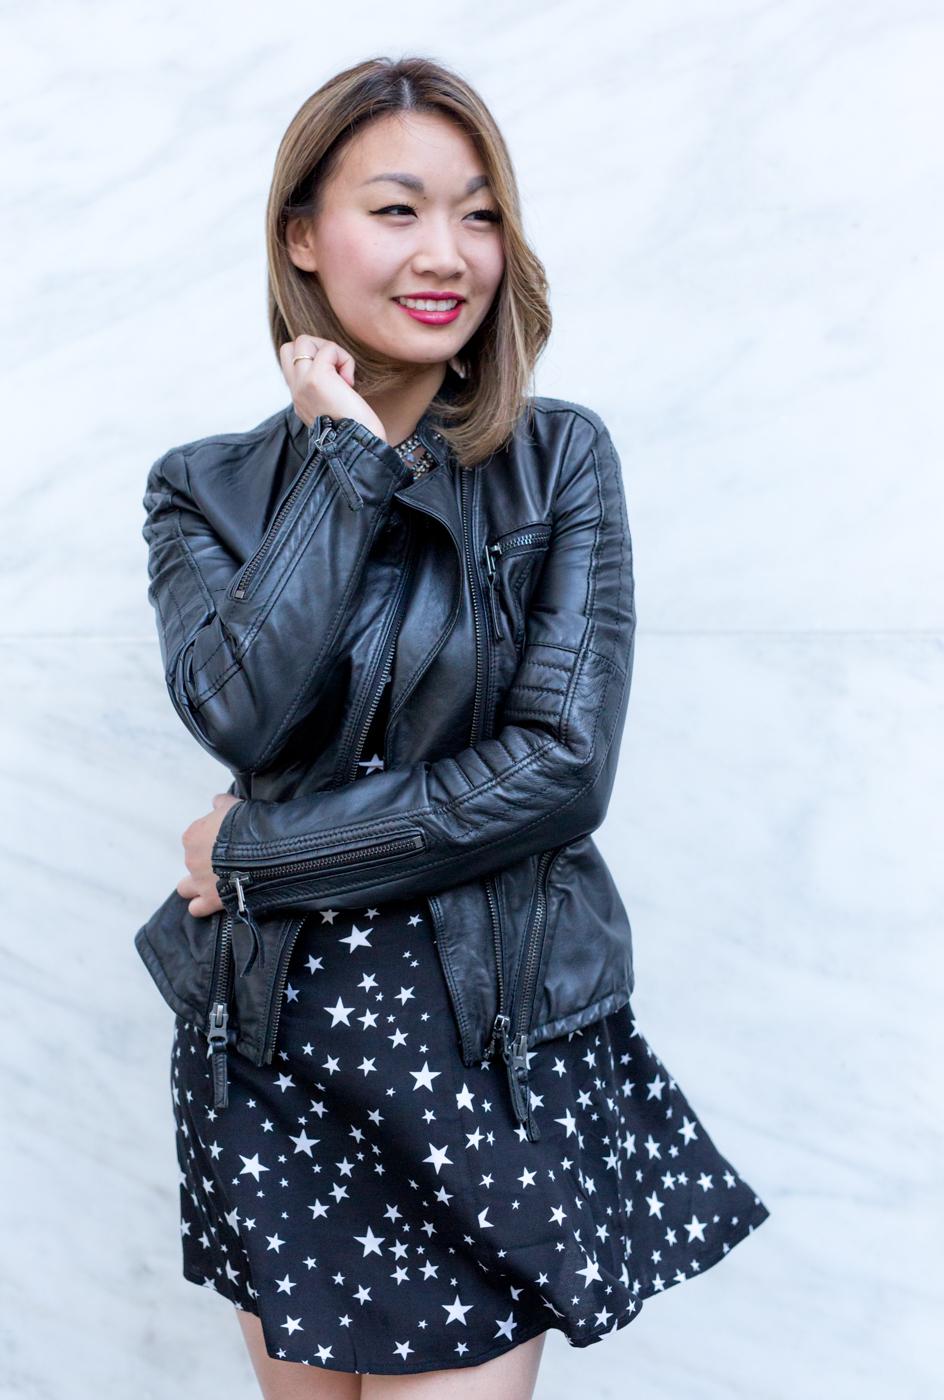 Zara Leather Jacket with Star Print Dress | The Chic Diary